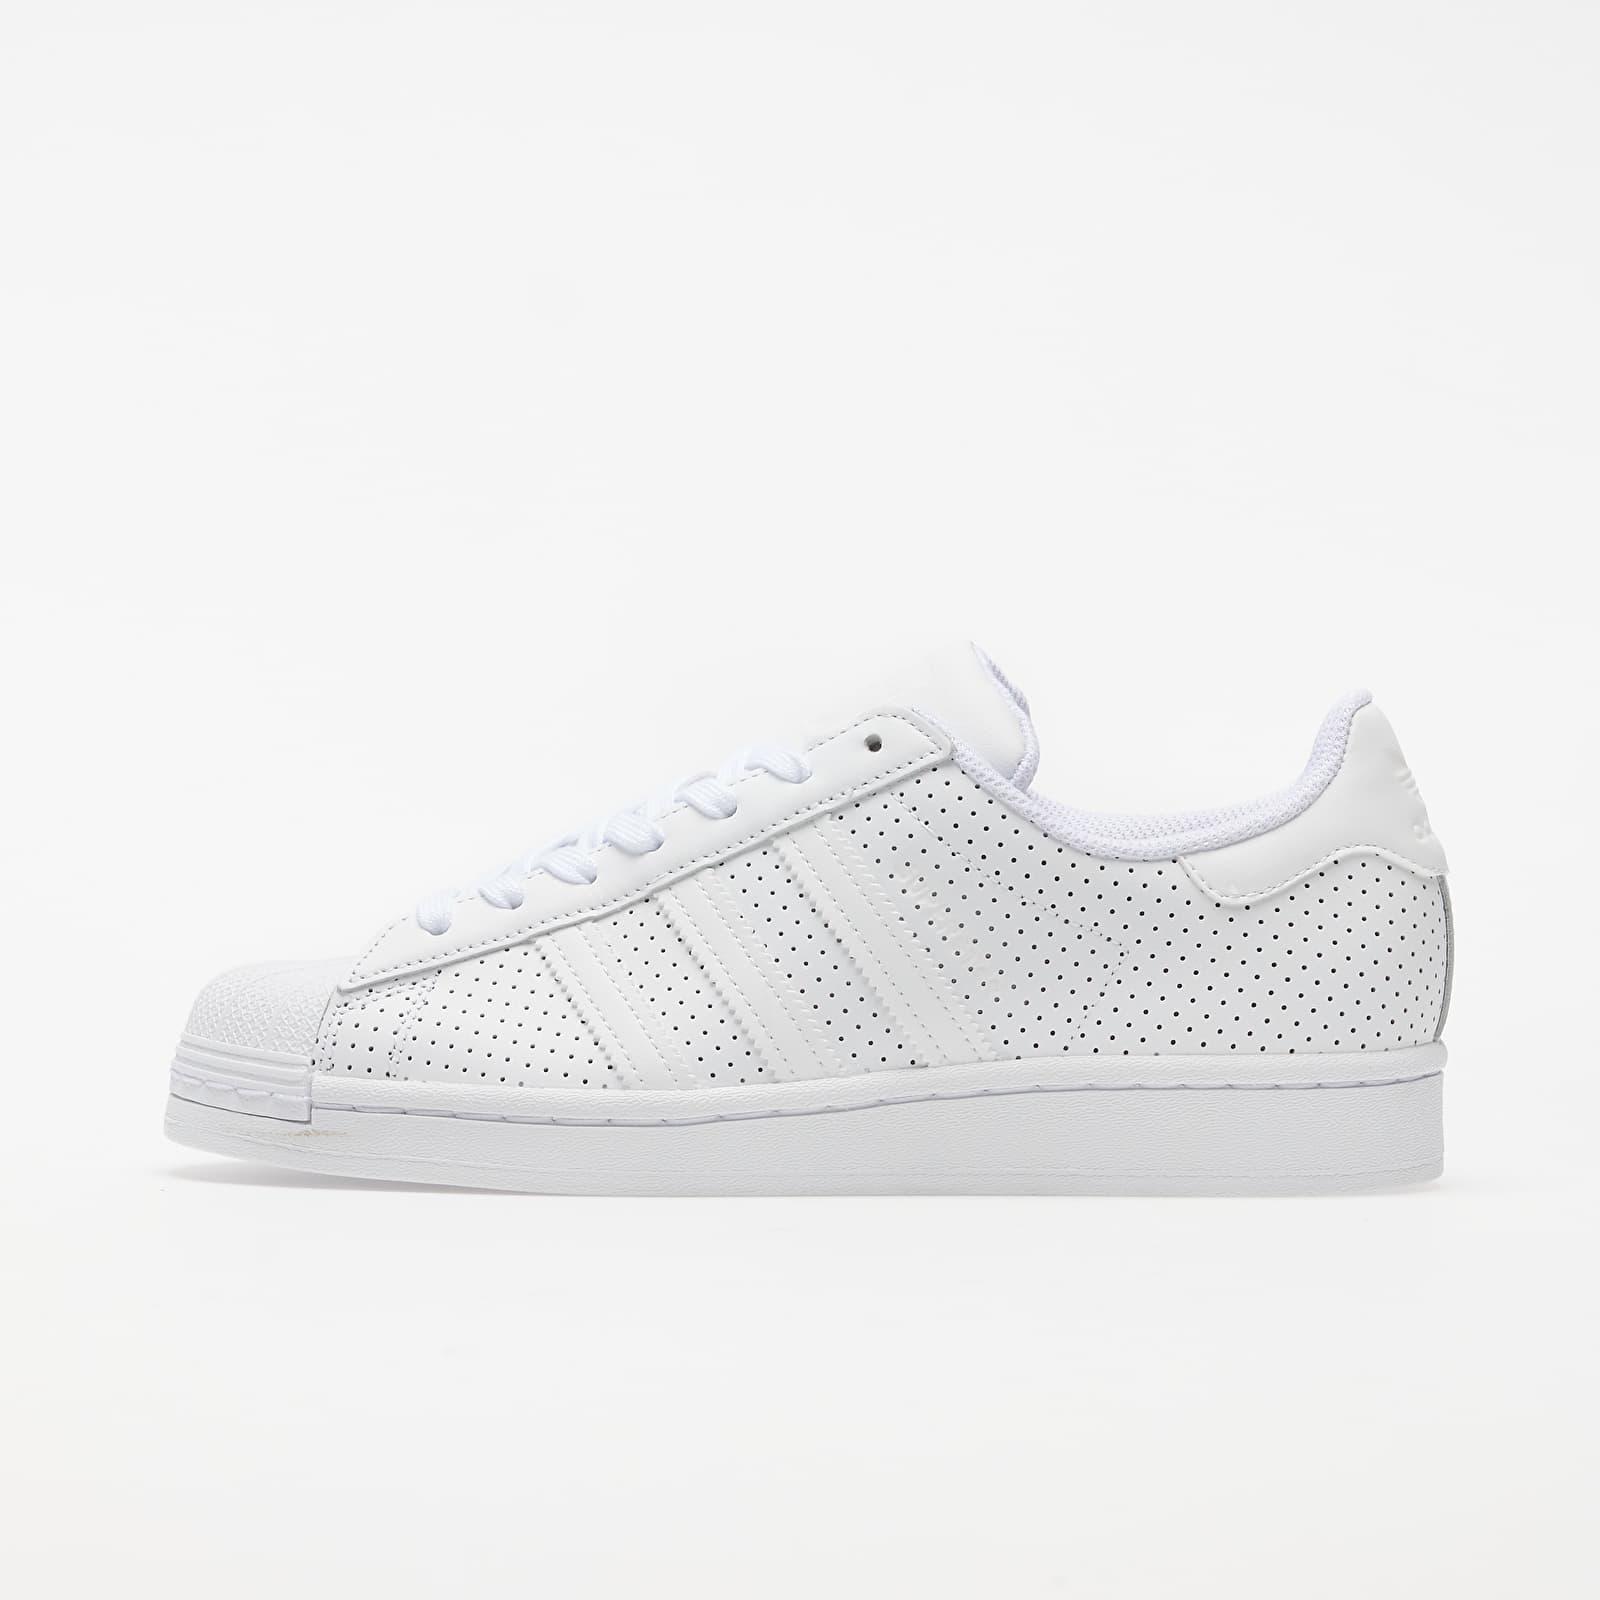 Zapatillas mujer adidas Superstar W Ftw White/ Ftw White/ Ftw White